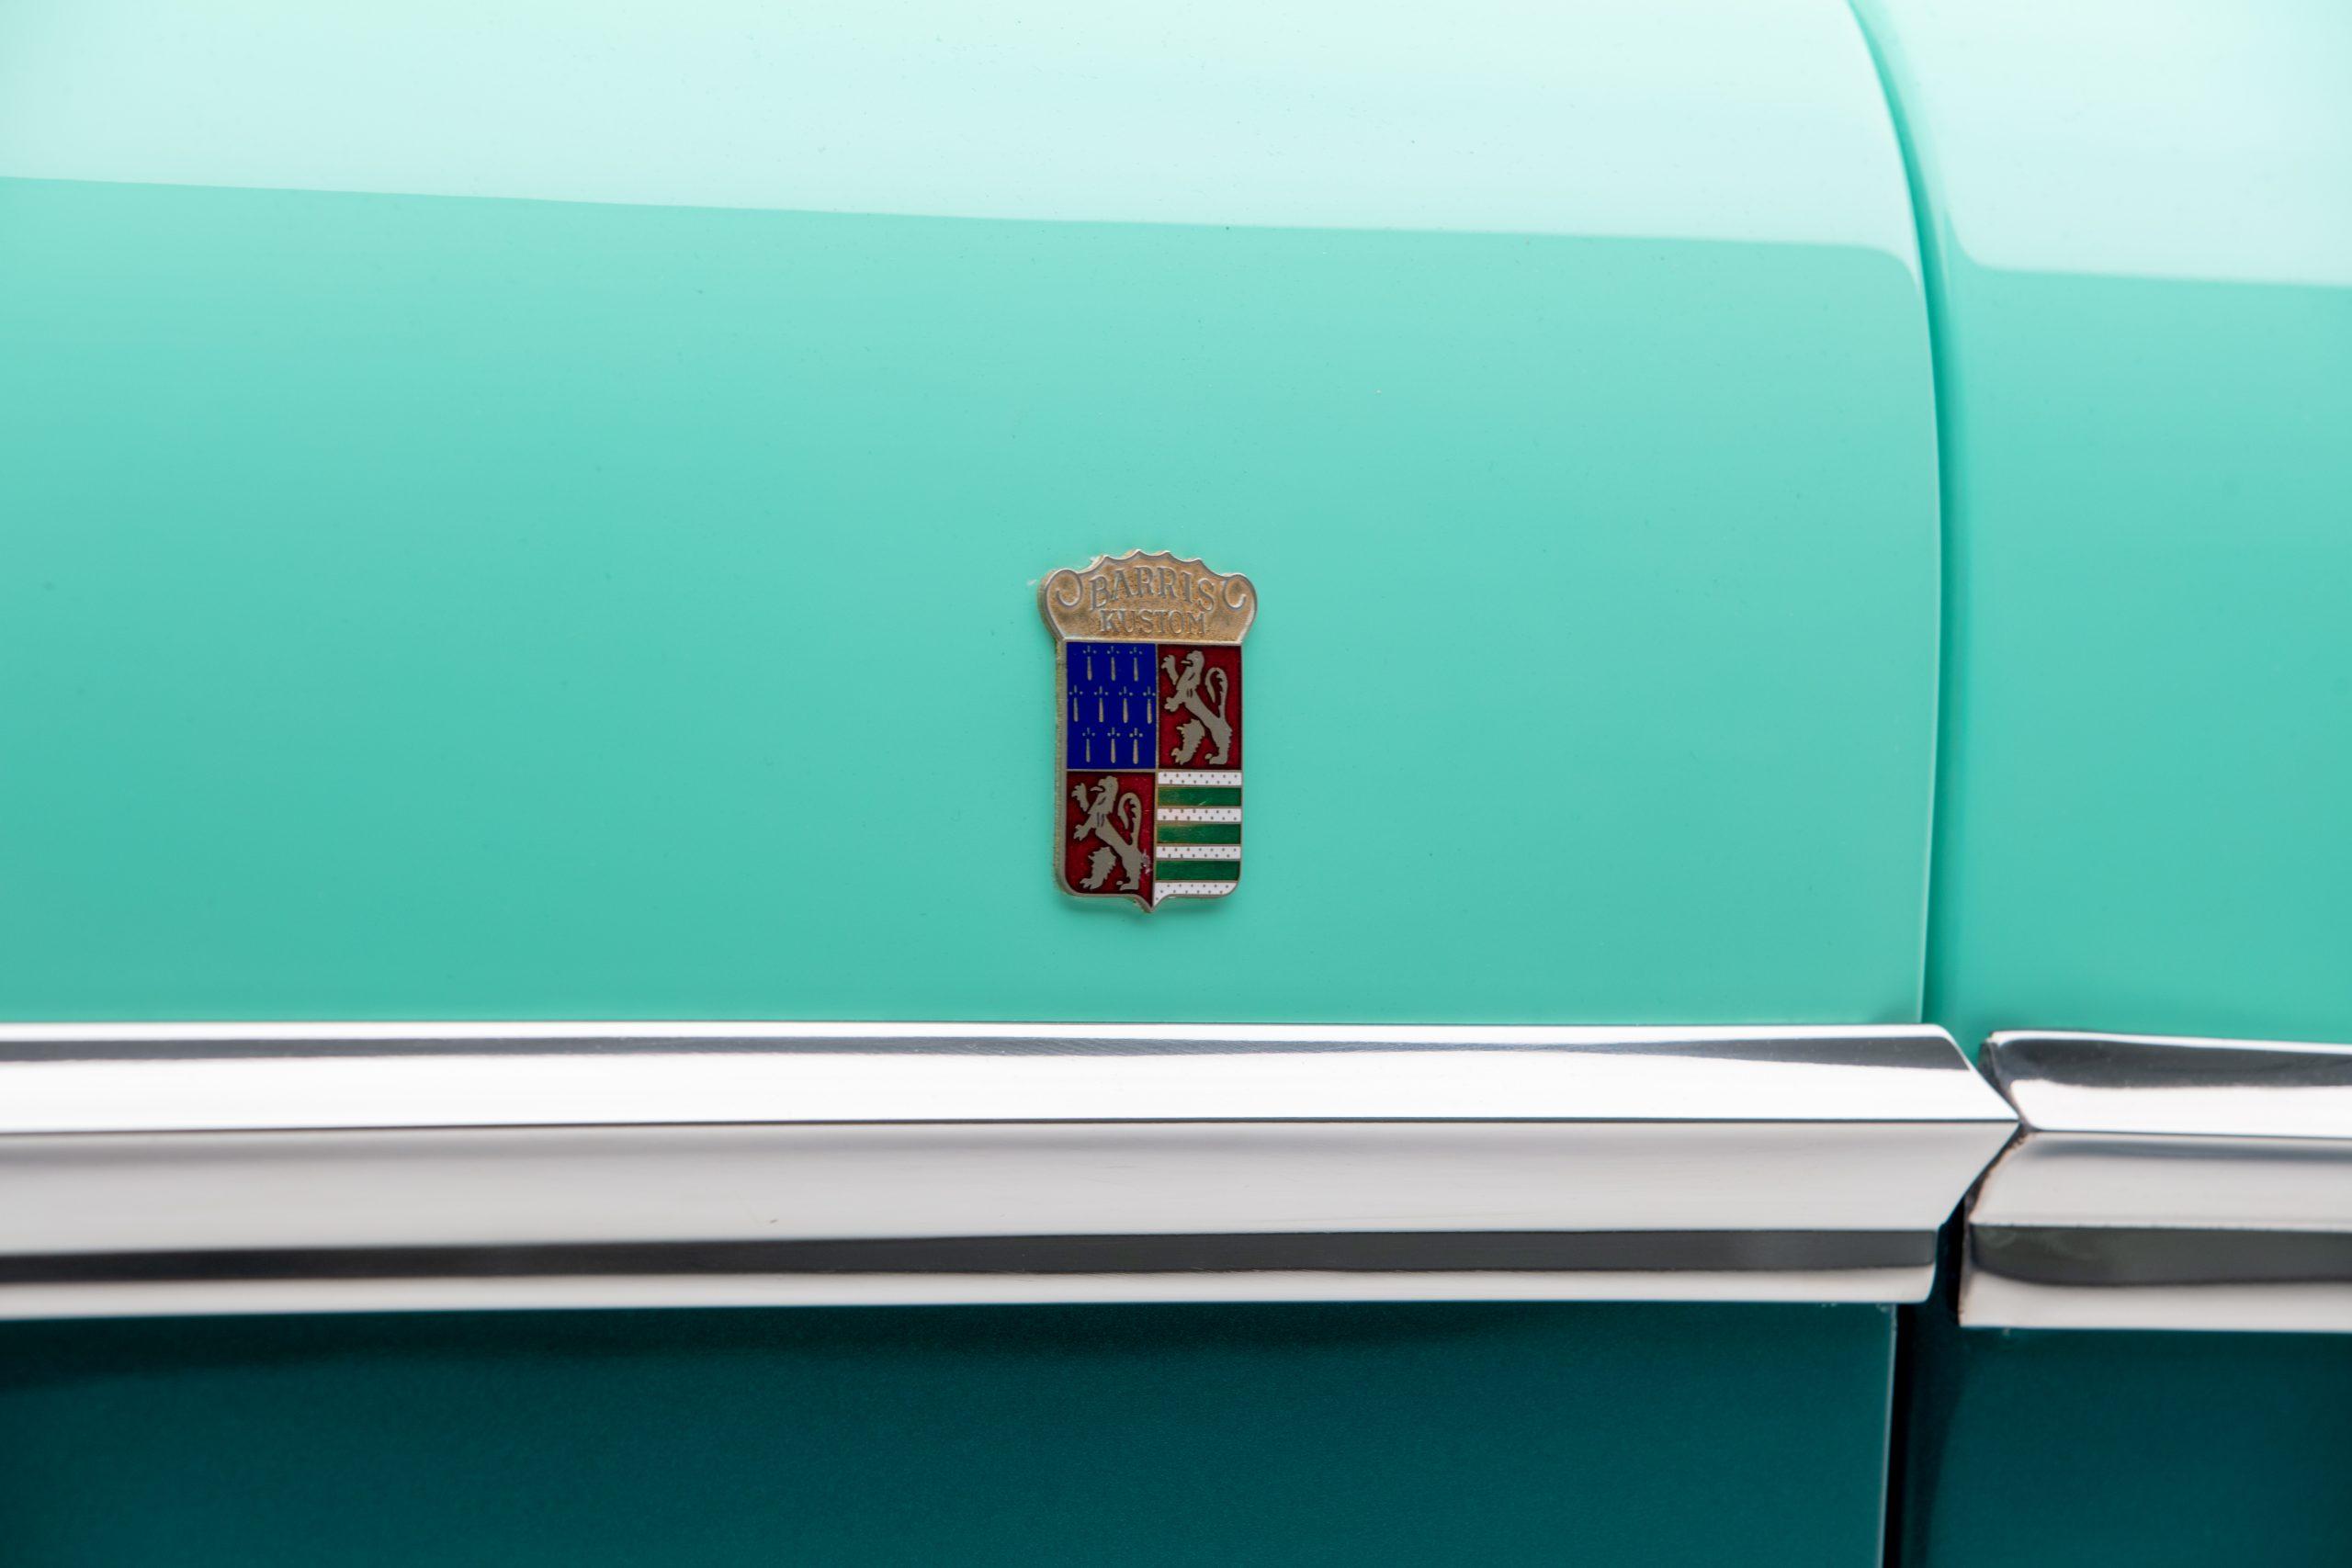 HVA Hirohata Mercury Barris badge